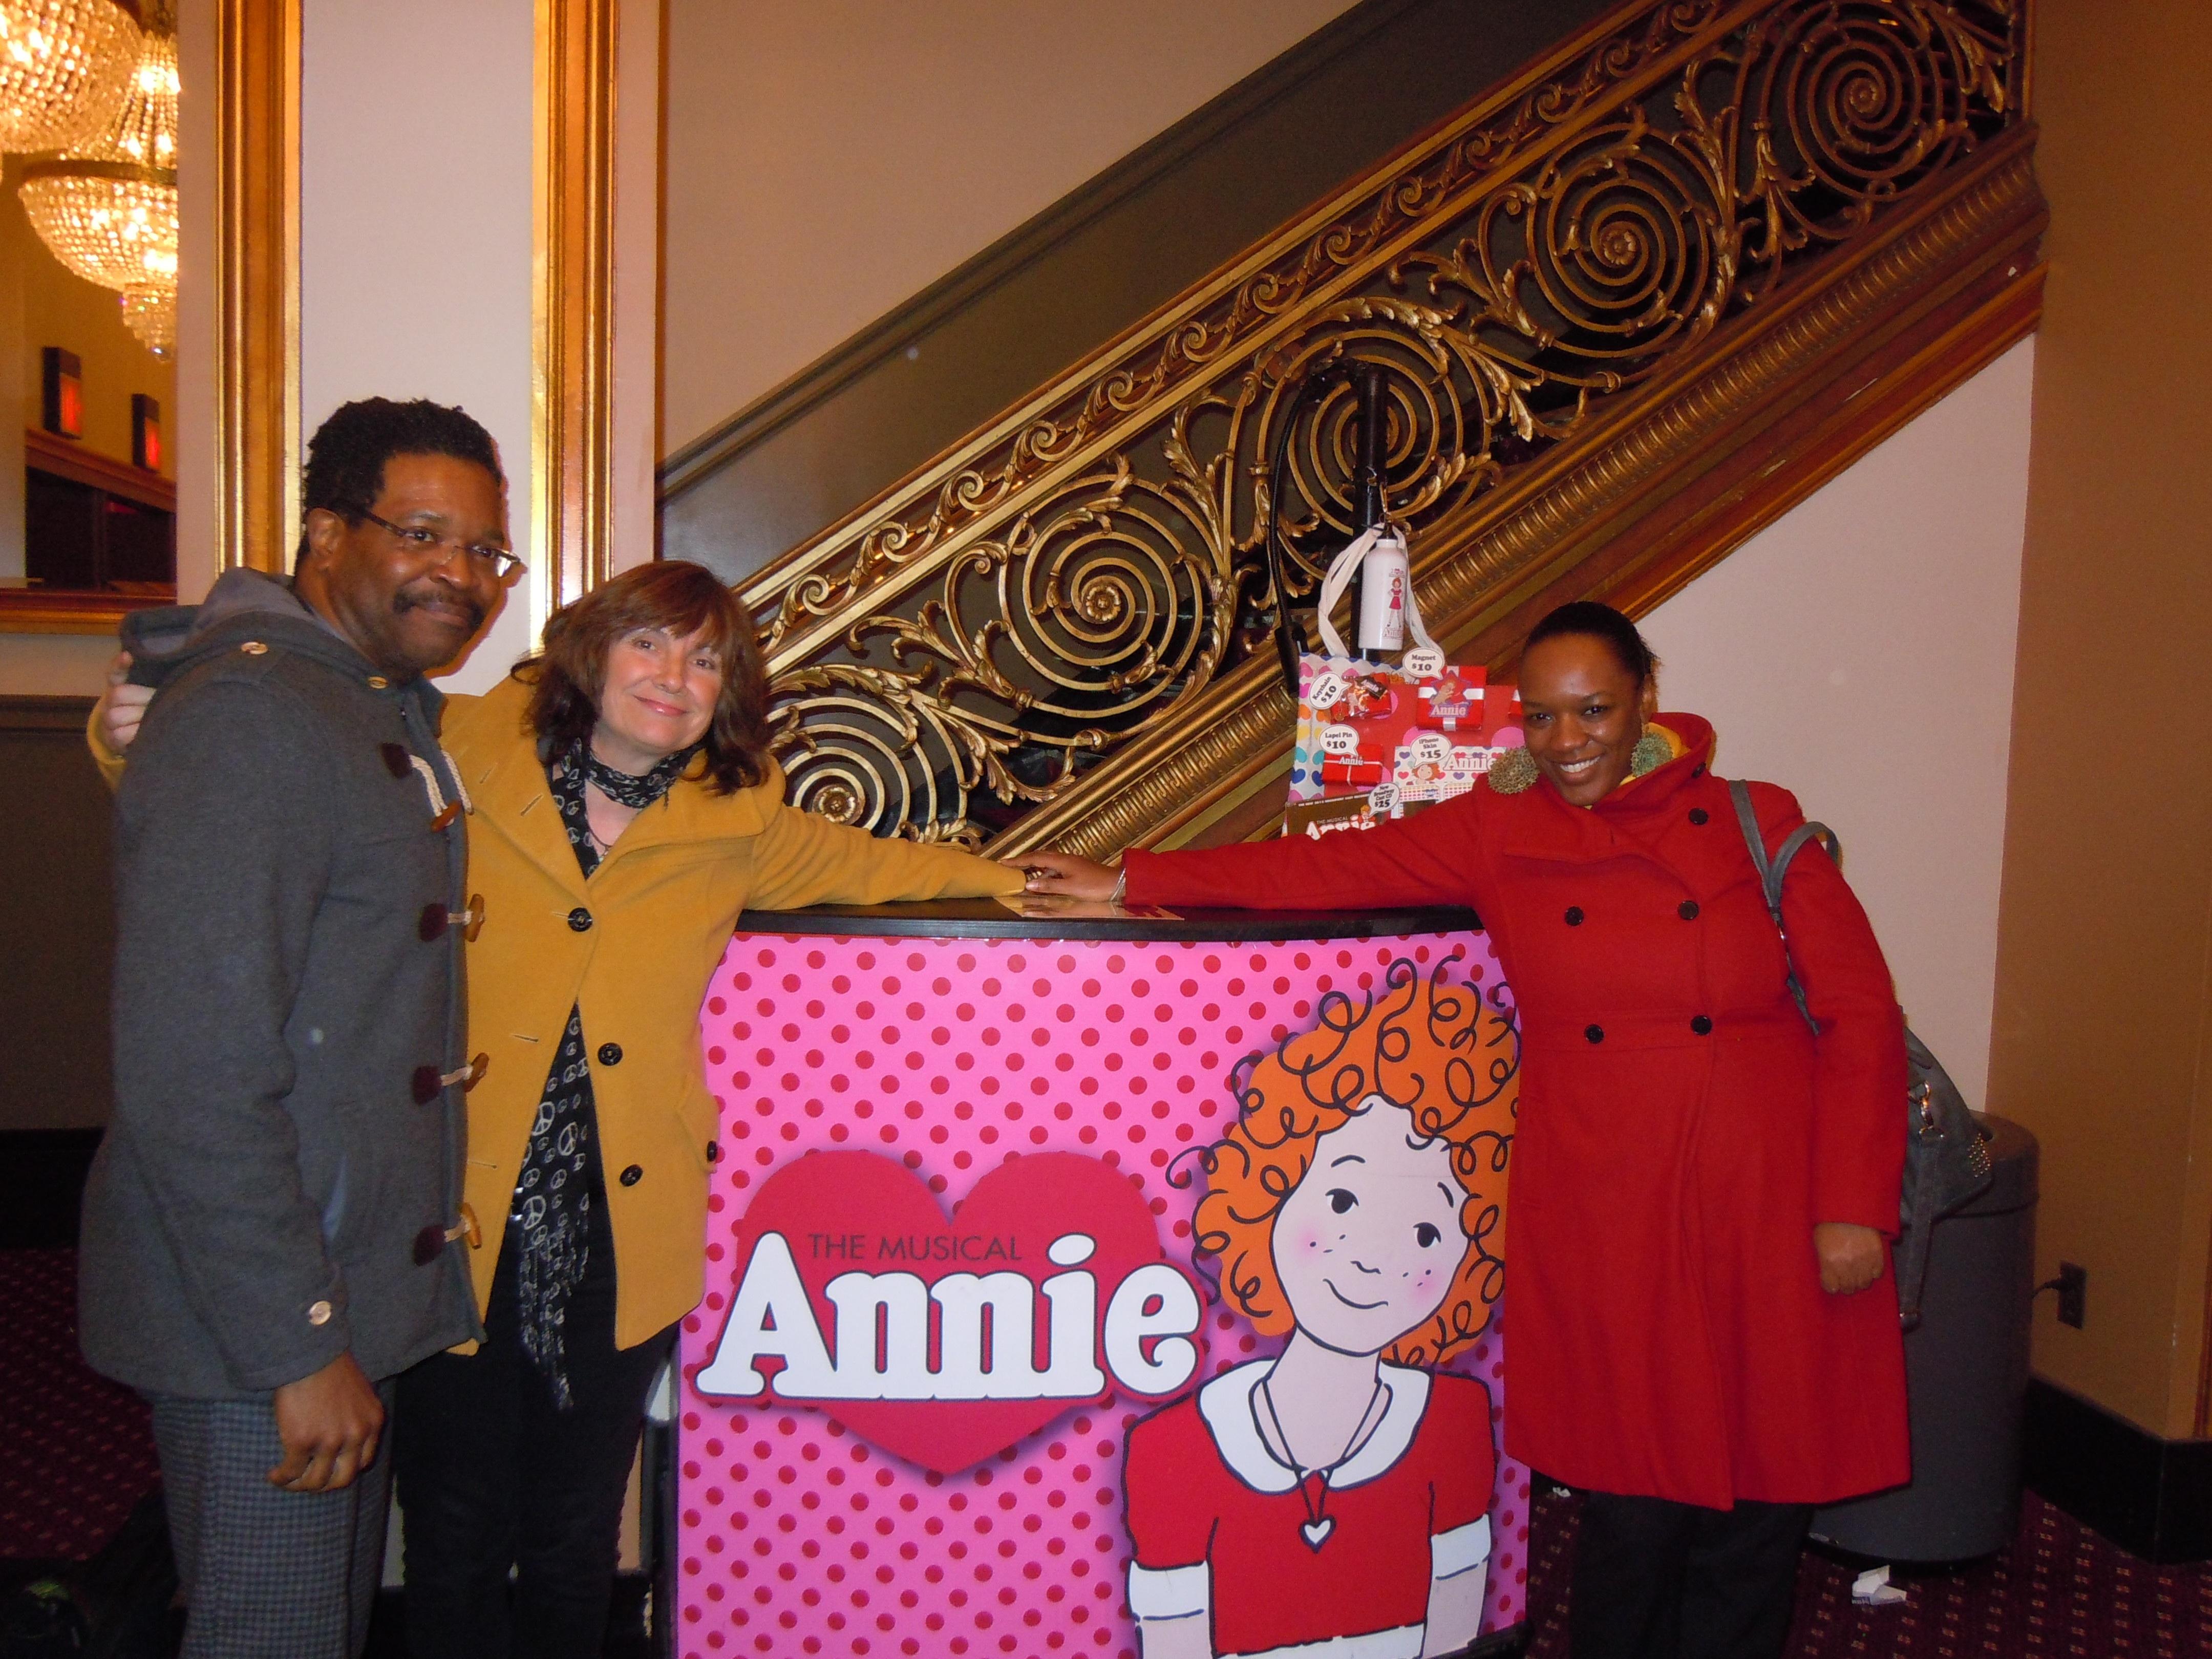 ANNIE on Broadway hosts Foster Your Dream